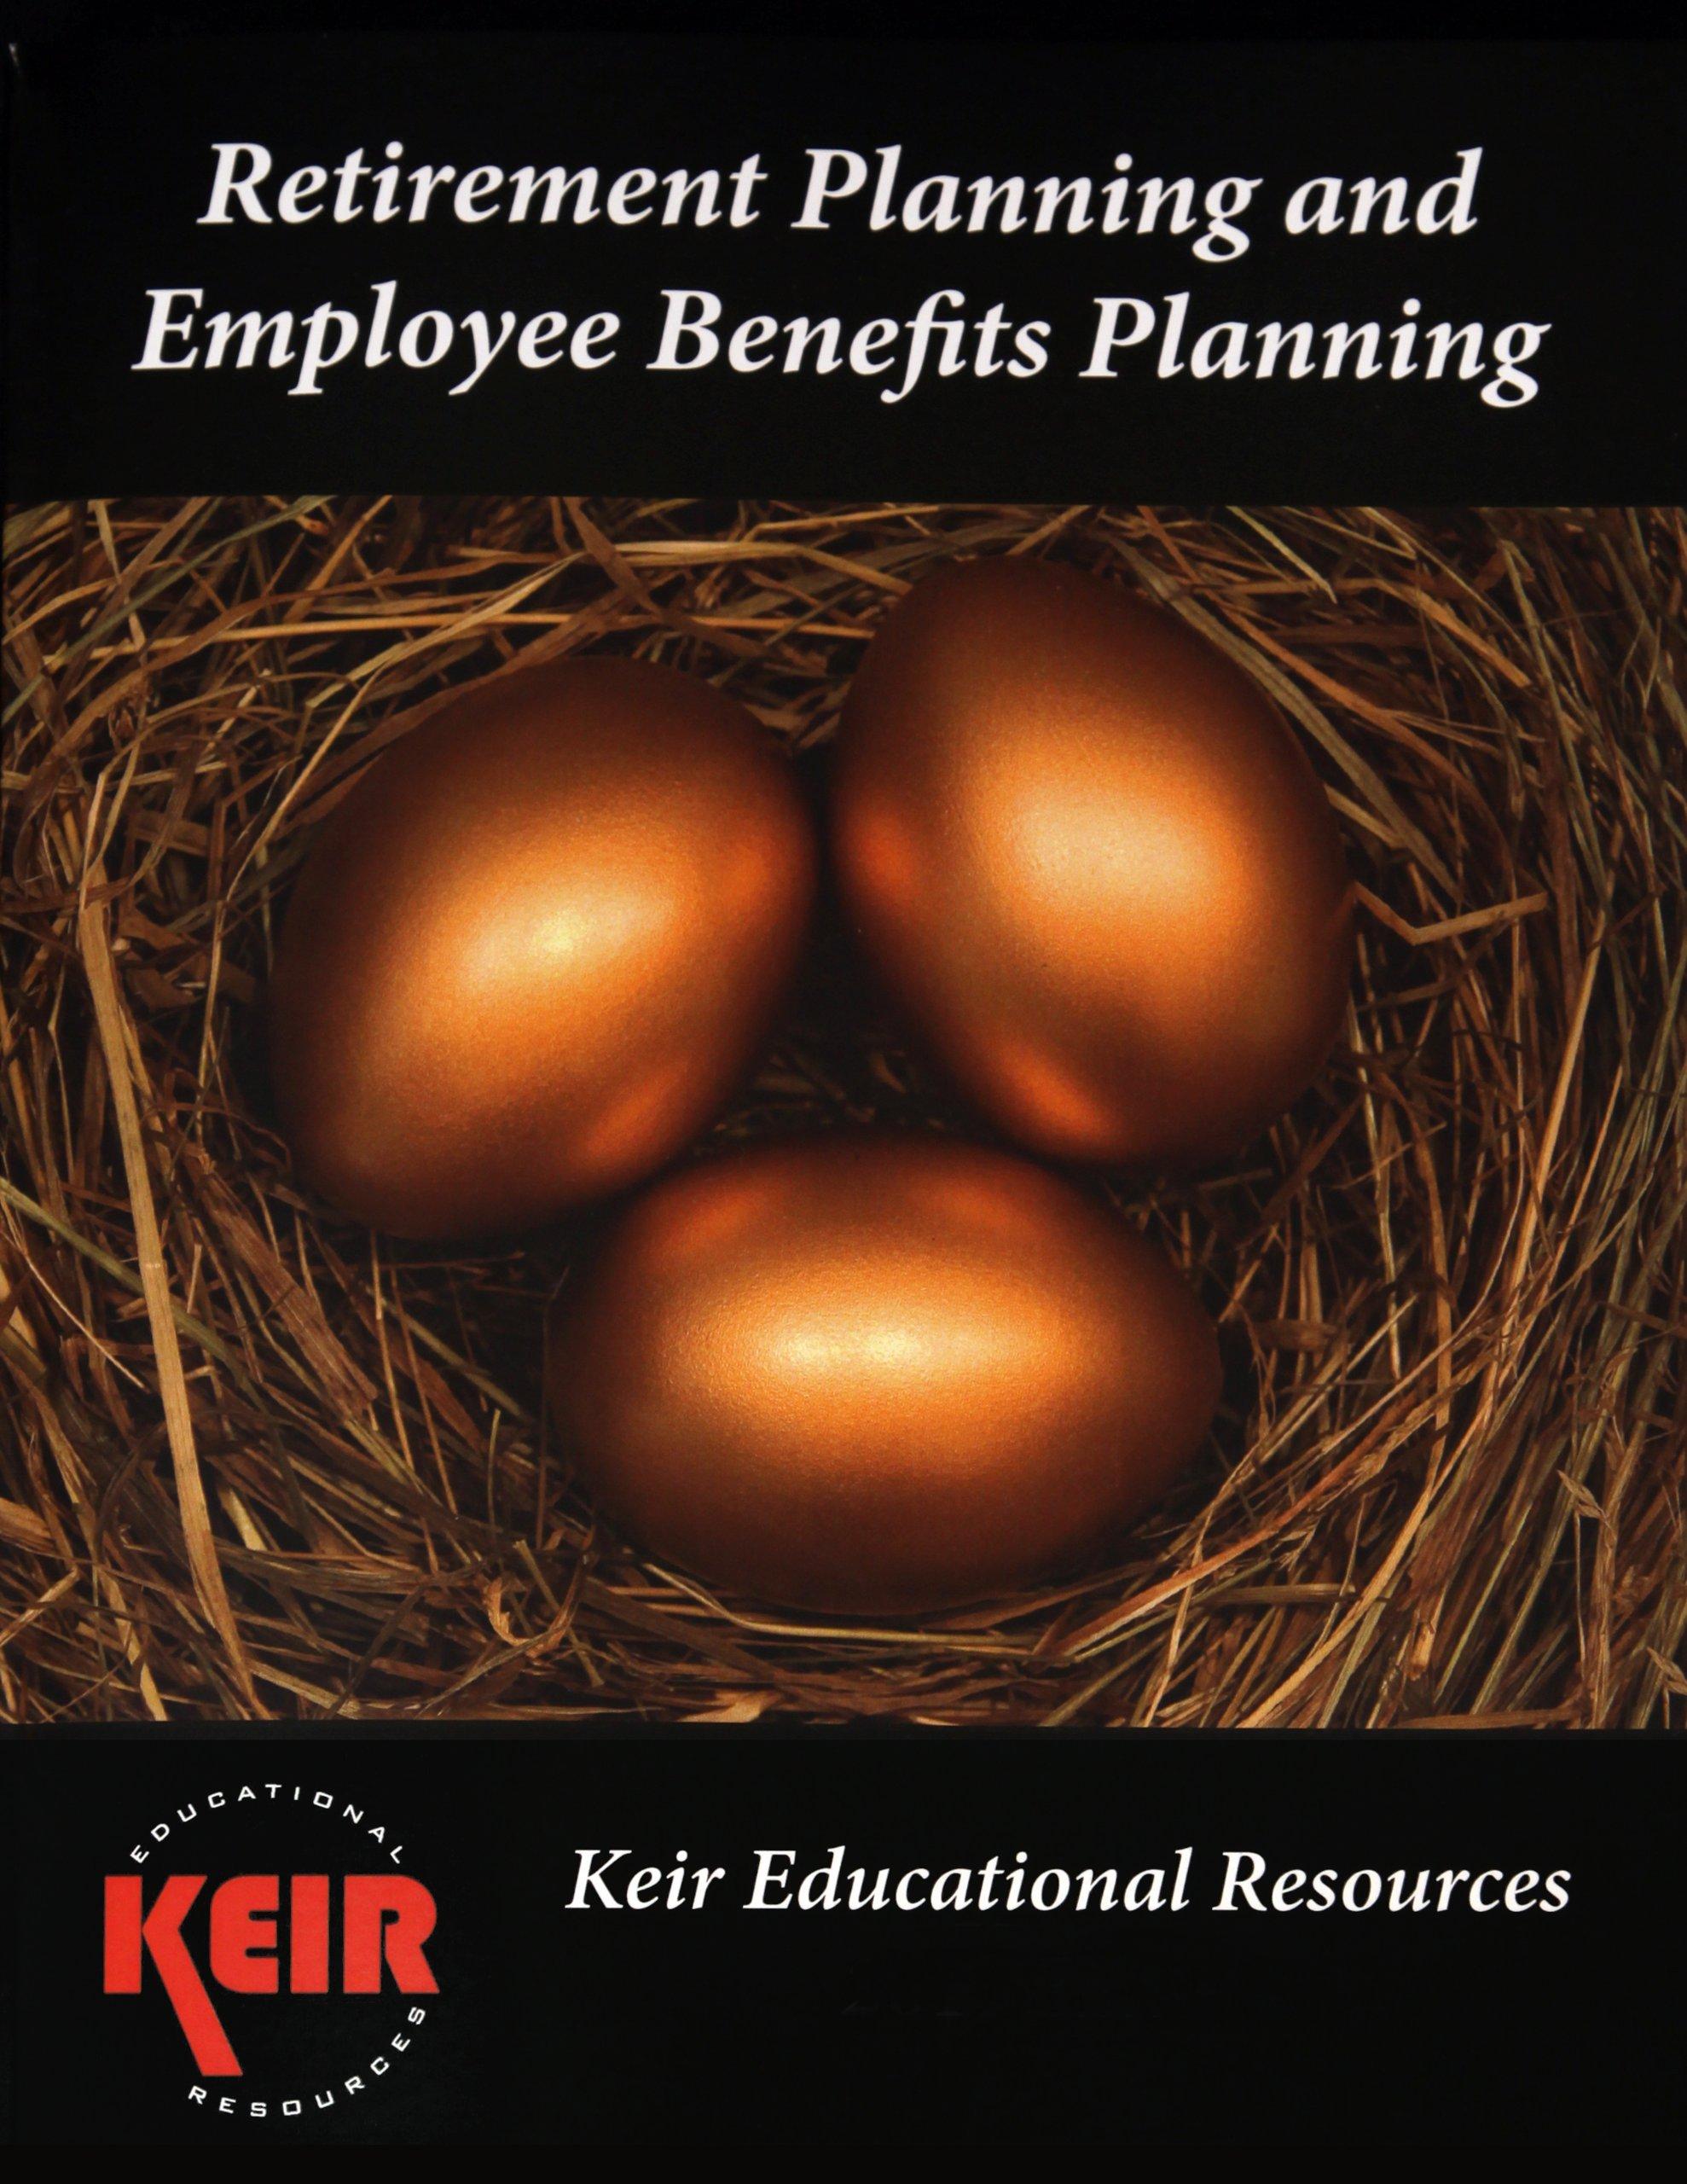 Retirement_Planning_Textbook.jpg